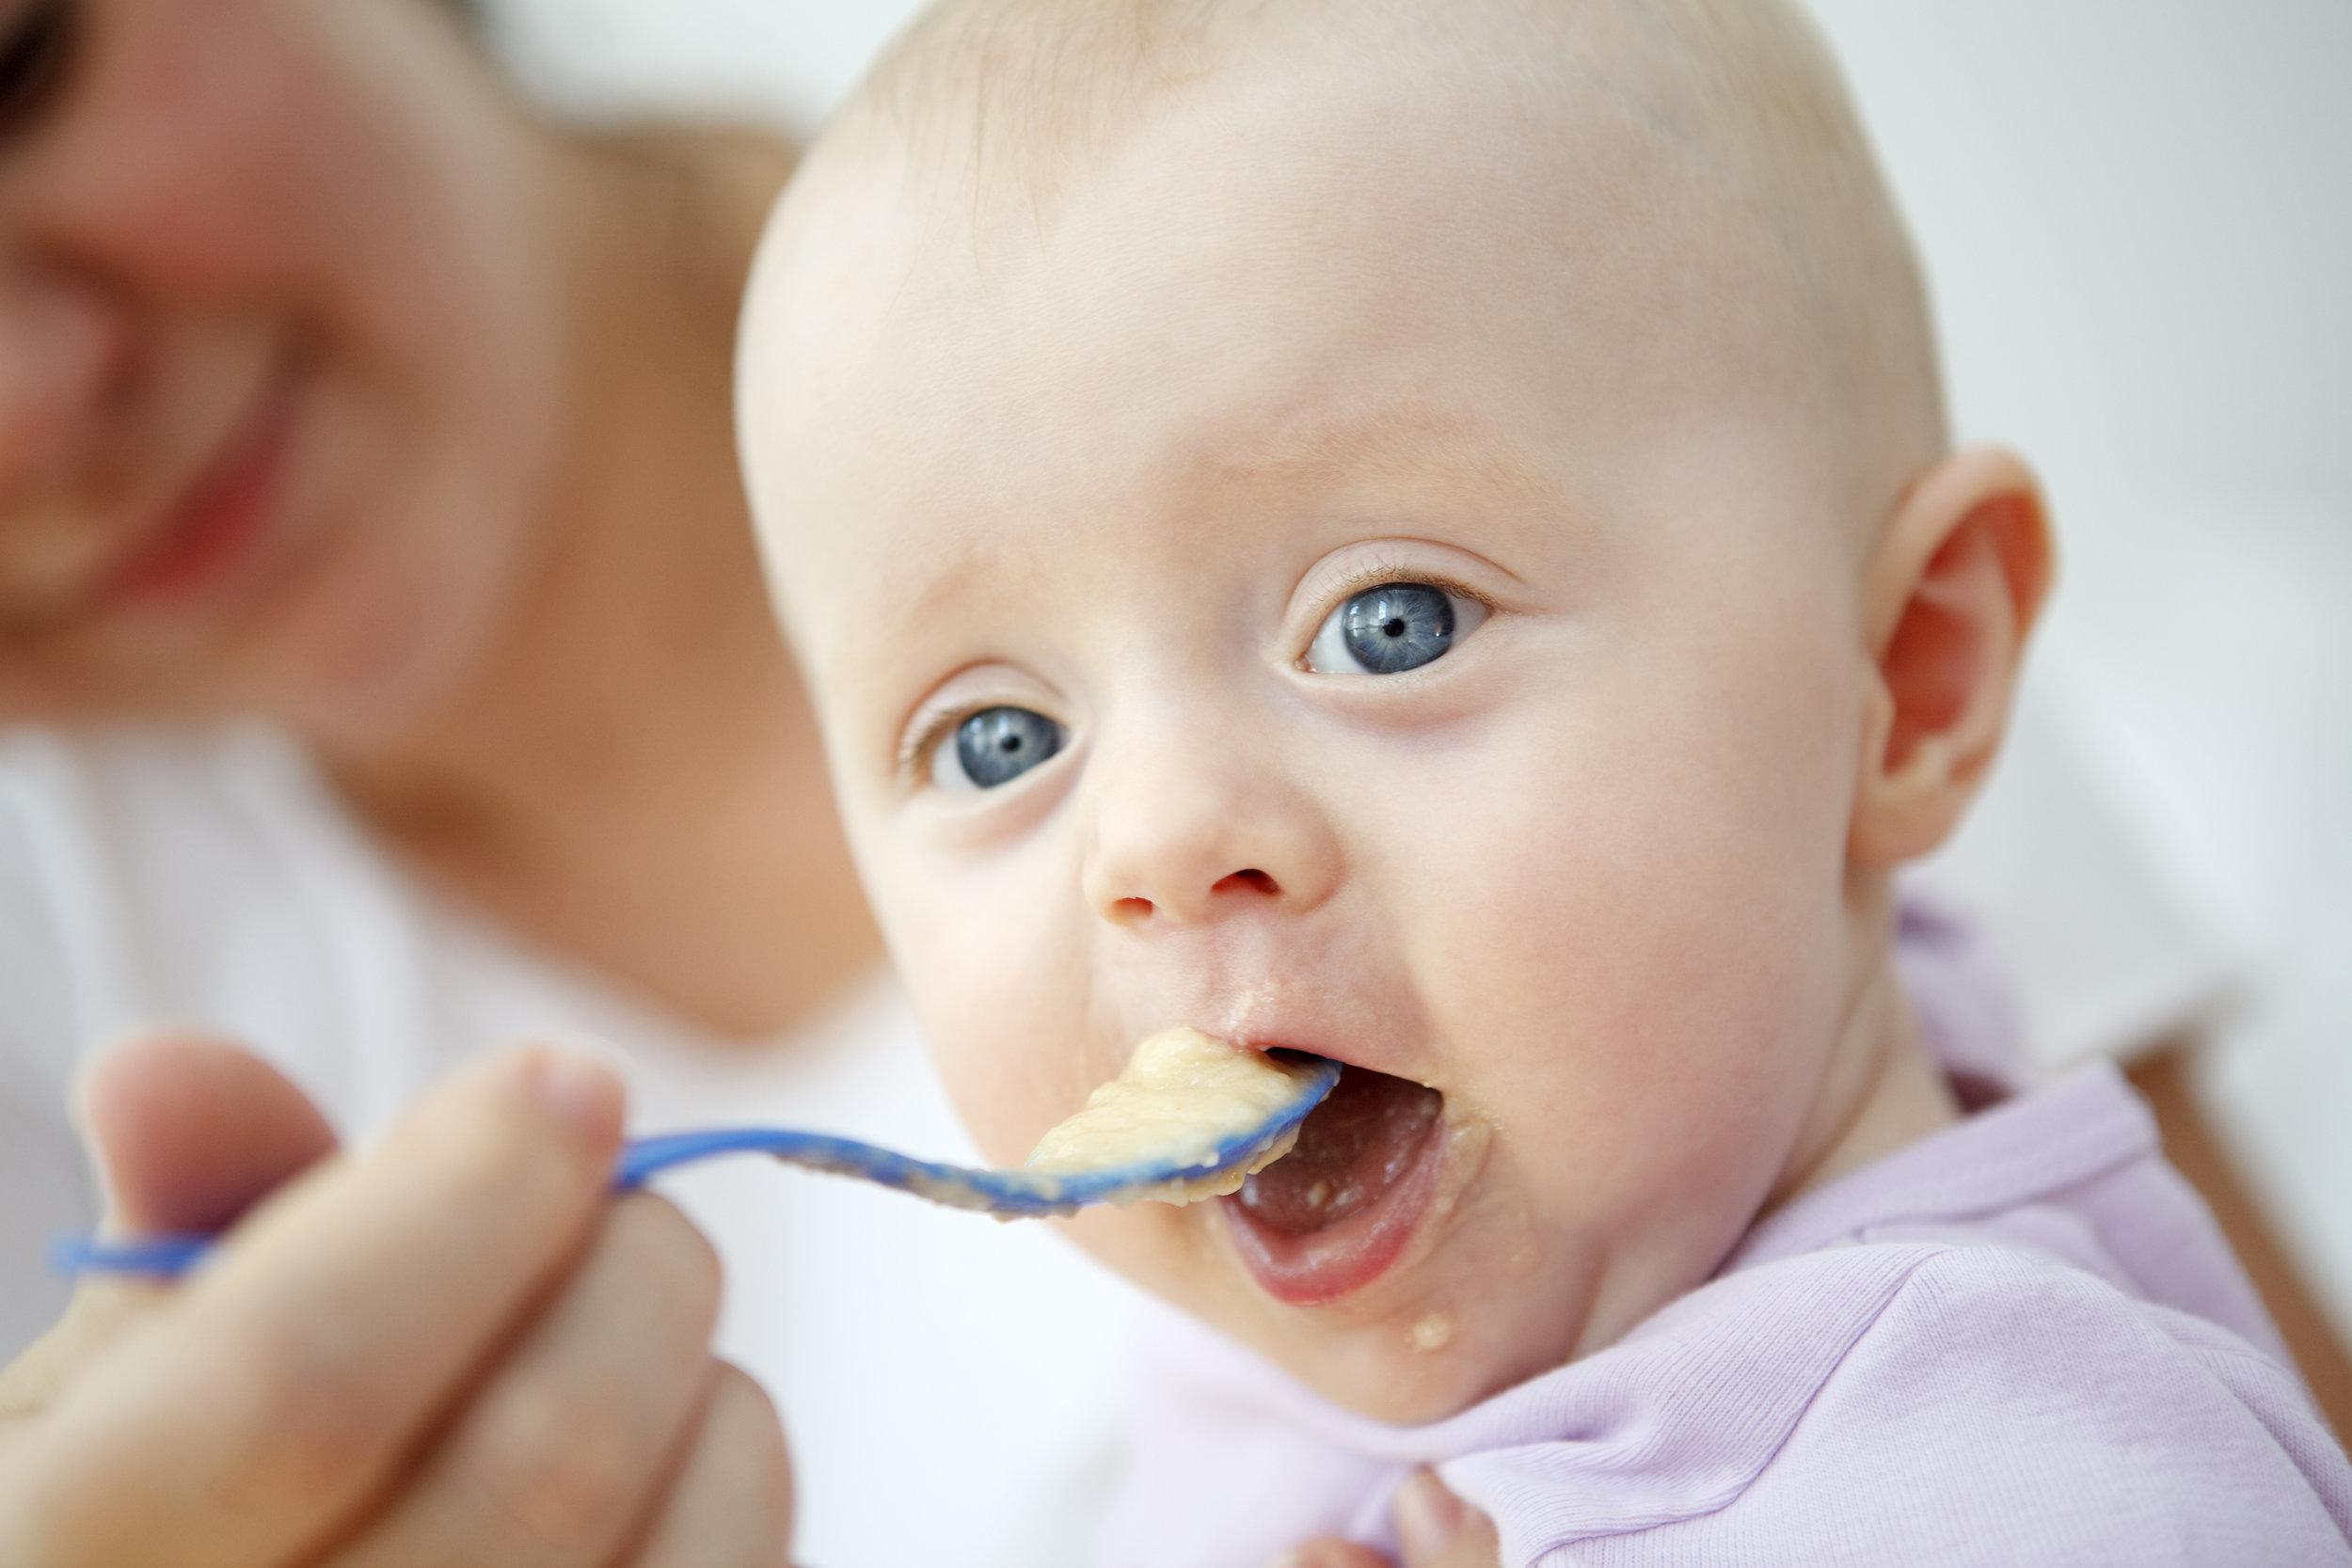 Mother-feeding-her-baby-182922928_3867x2578.jpeg